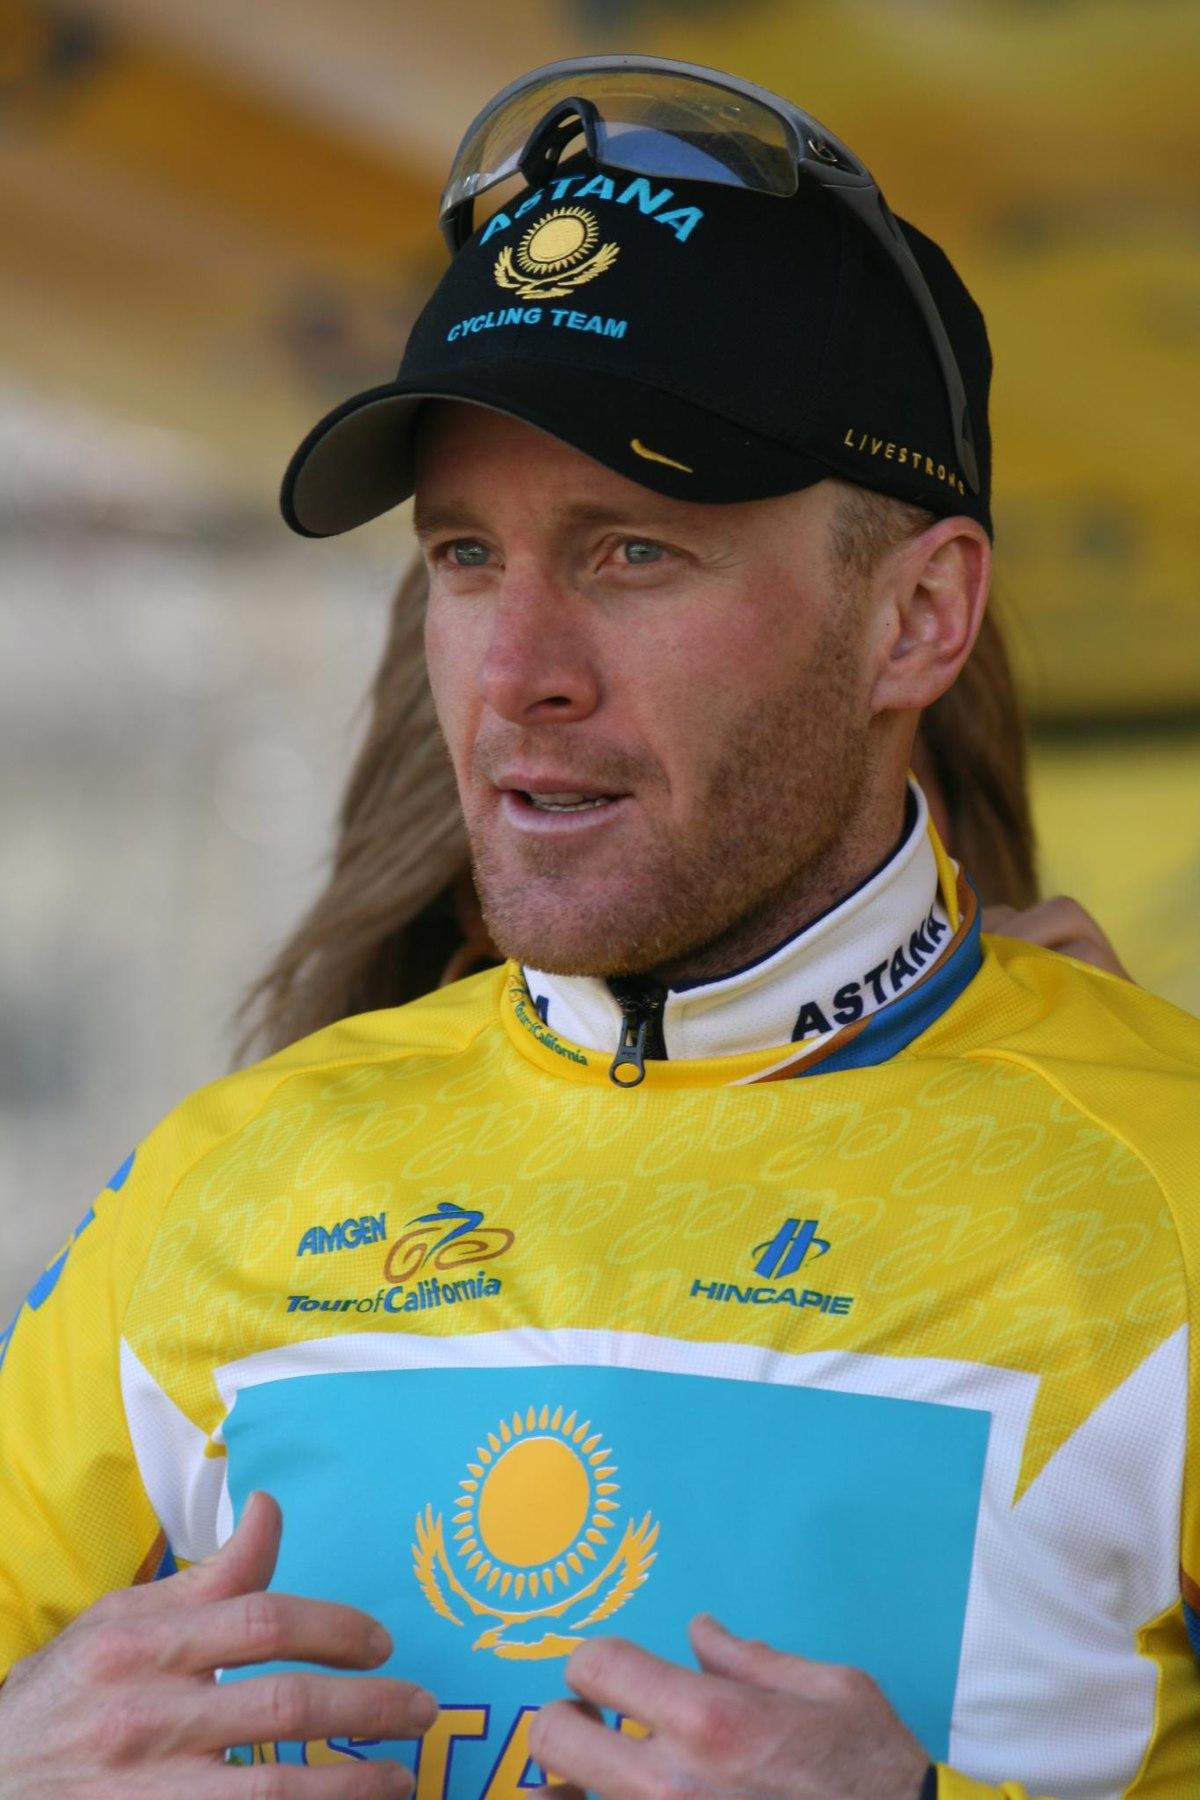 Sonoma Coast Cyclists, Levi Leipheimer